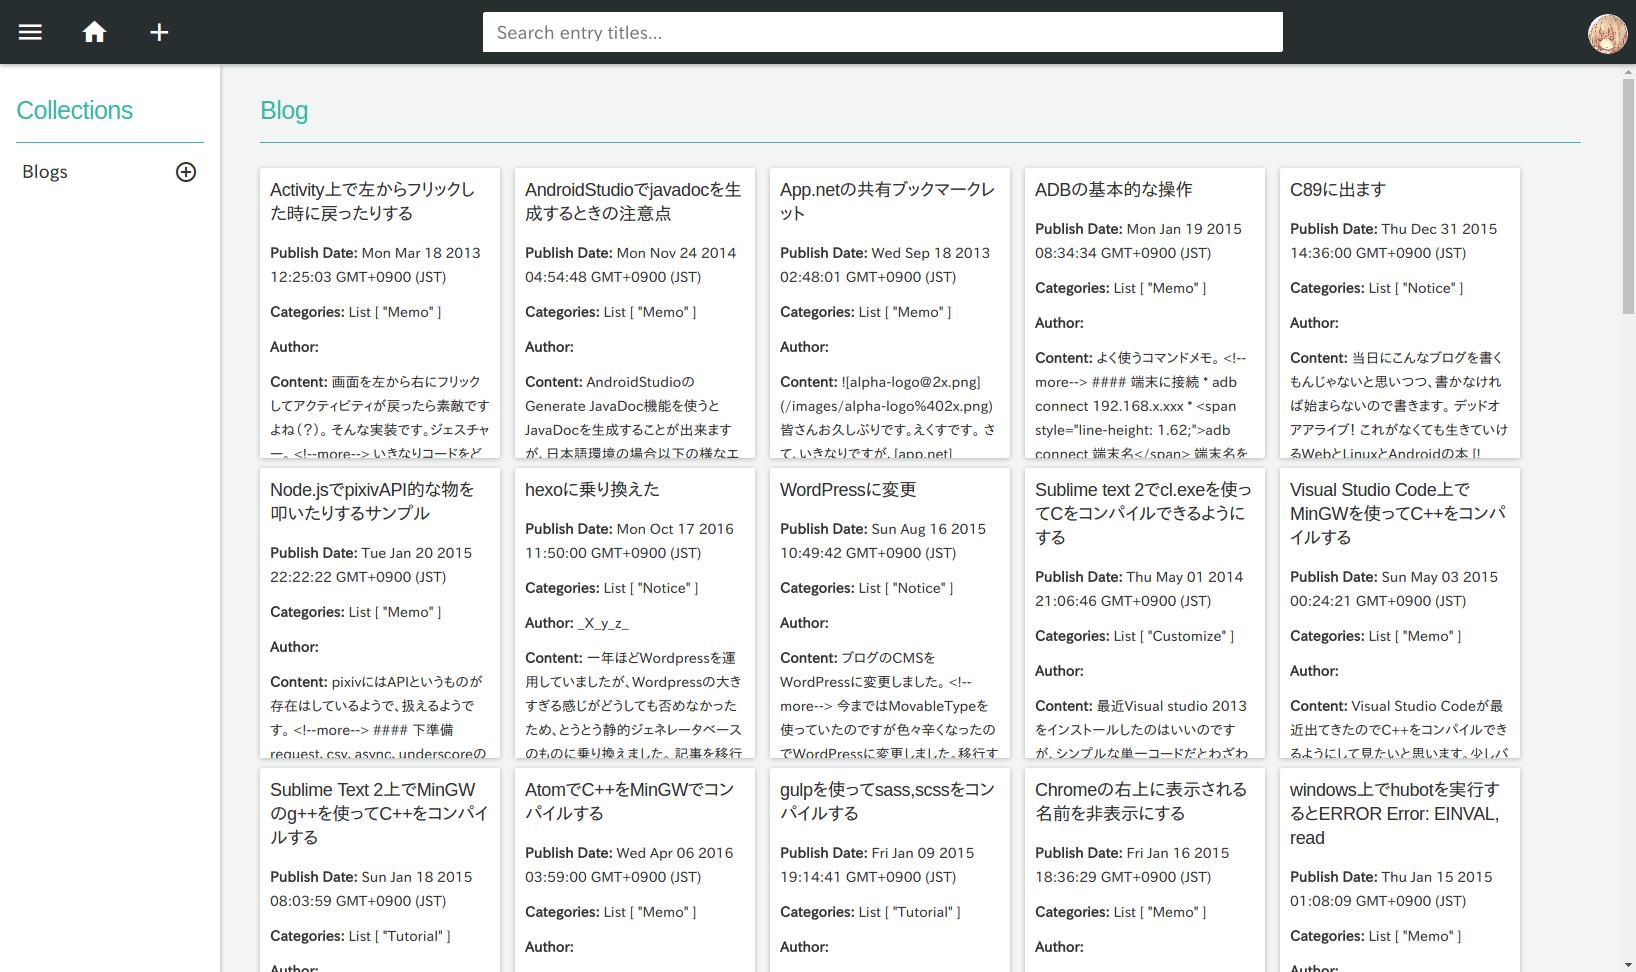 Netlify CMSの管理画面。unsweets.logの記事一覧がカード形式で表示されている。